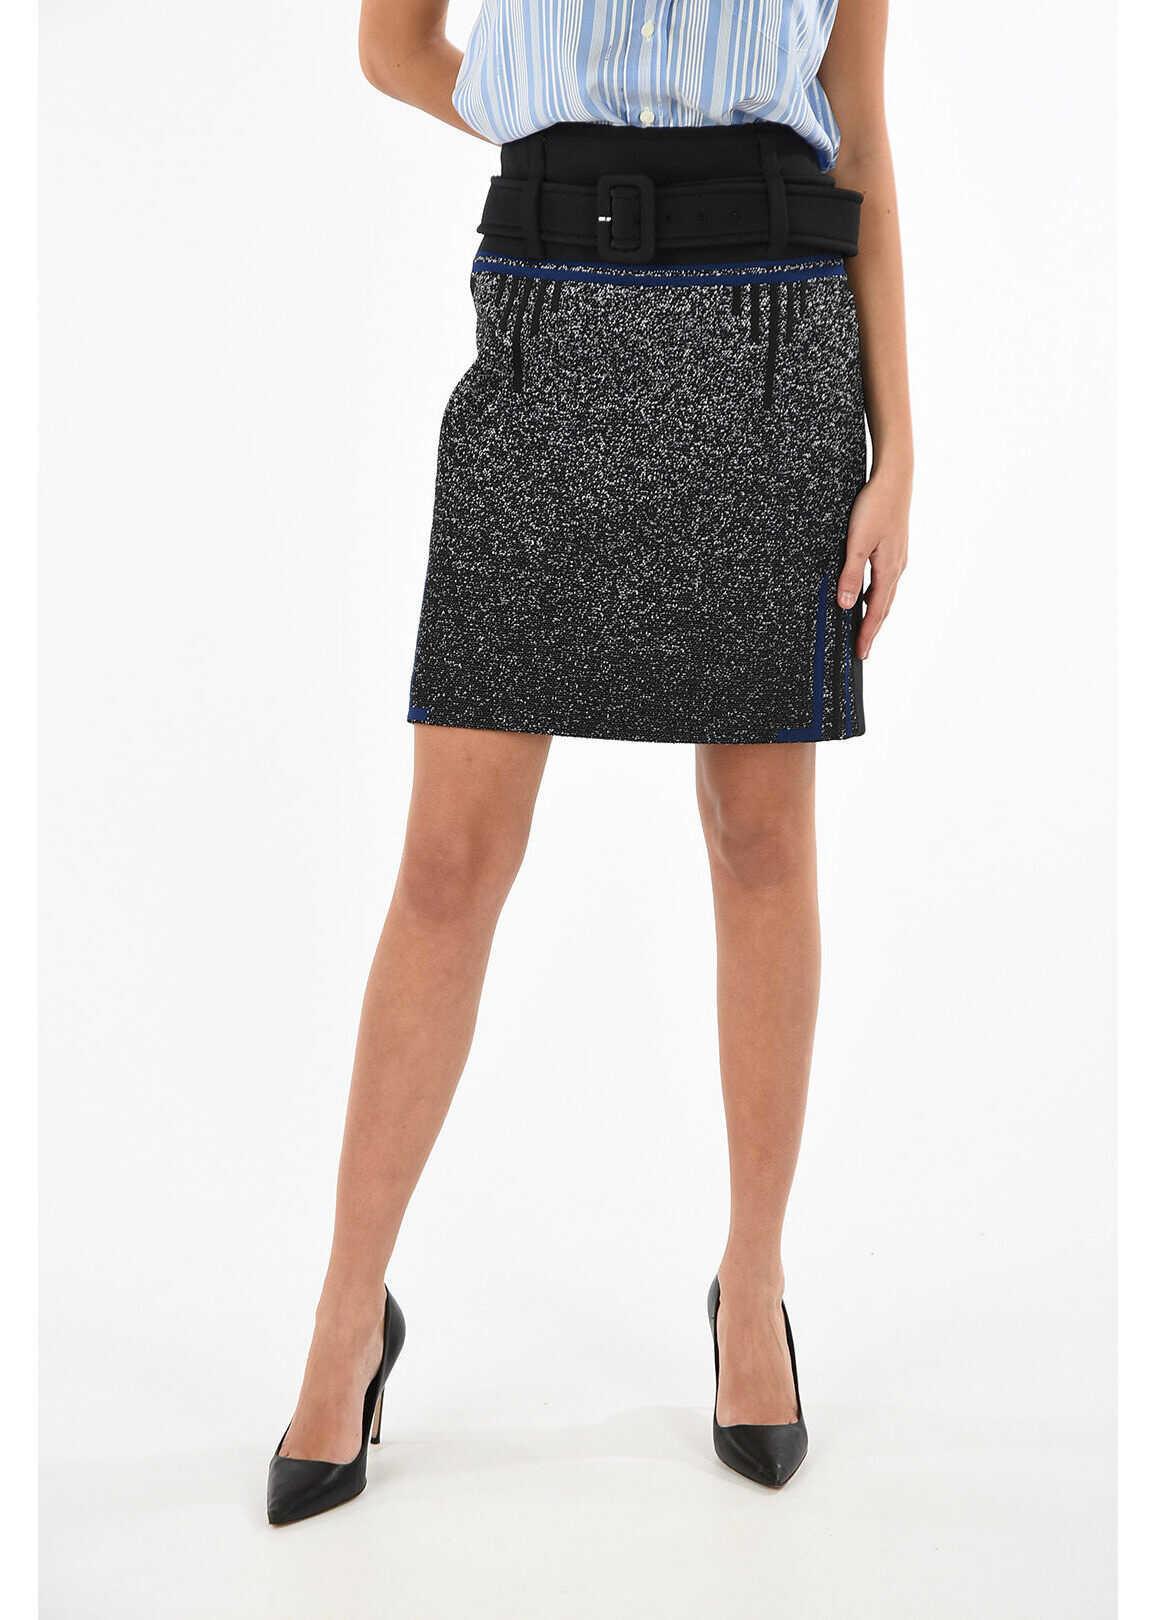 Prada split-back hem jacquard moulin midi a-line skirt BLACK